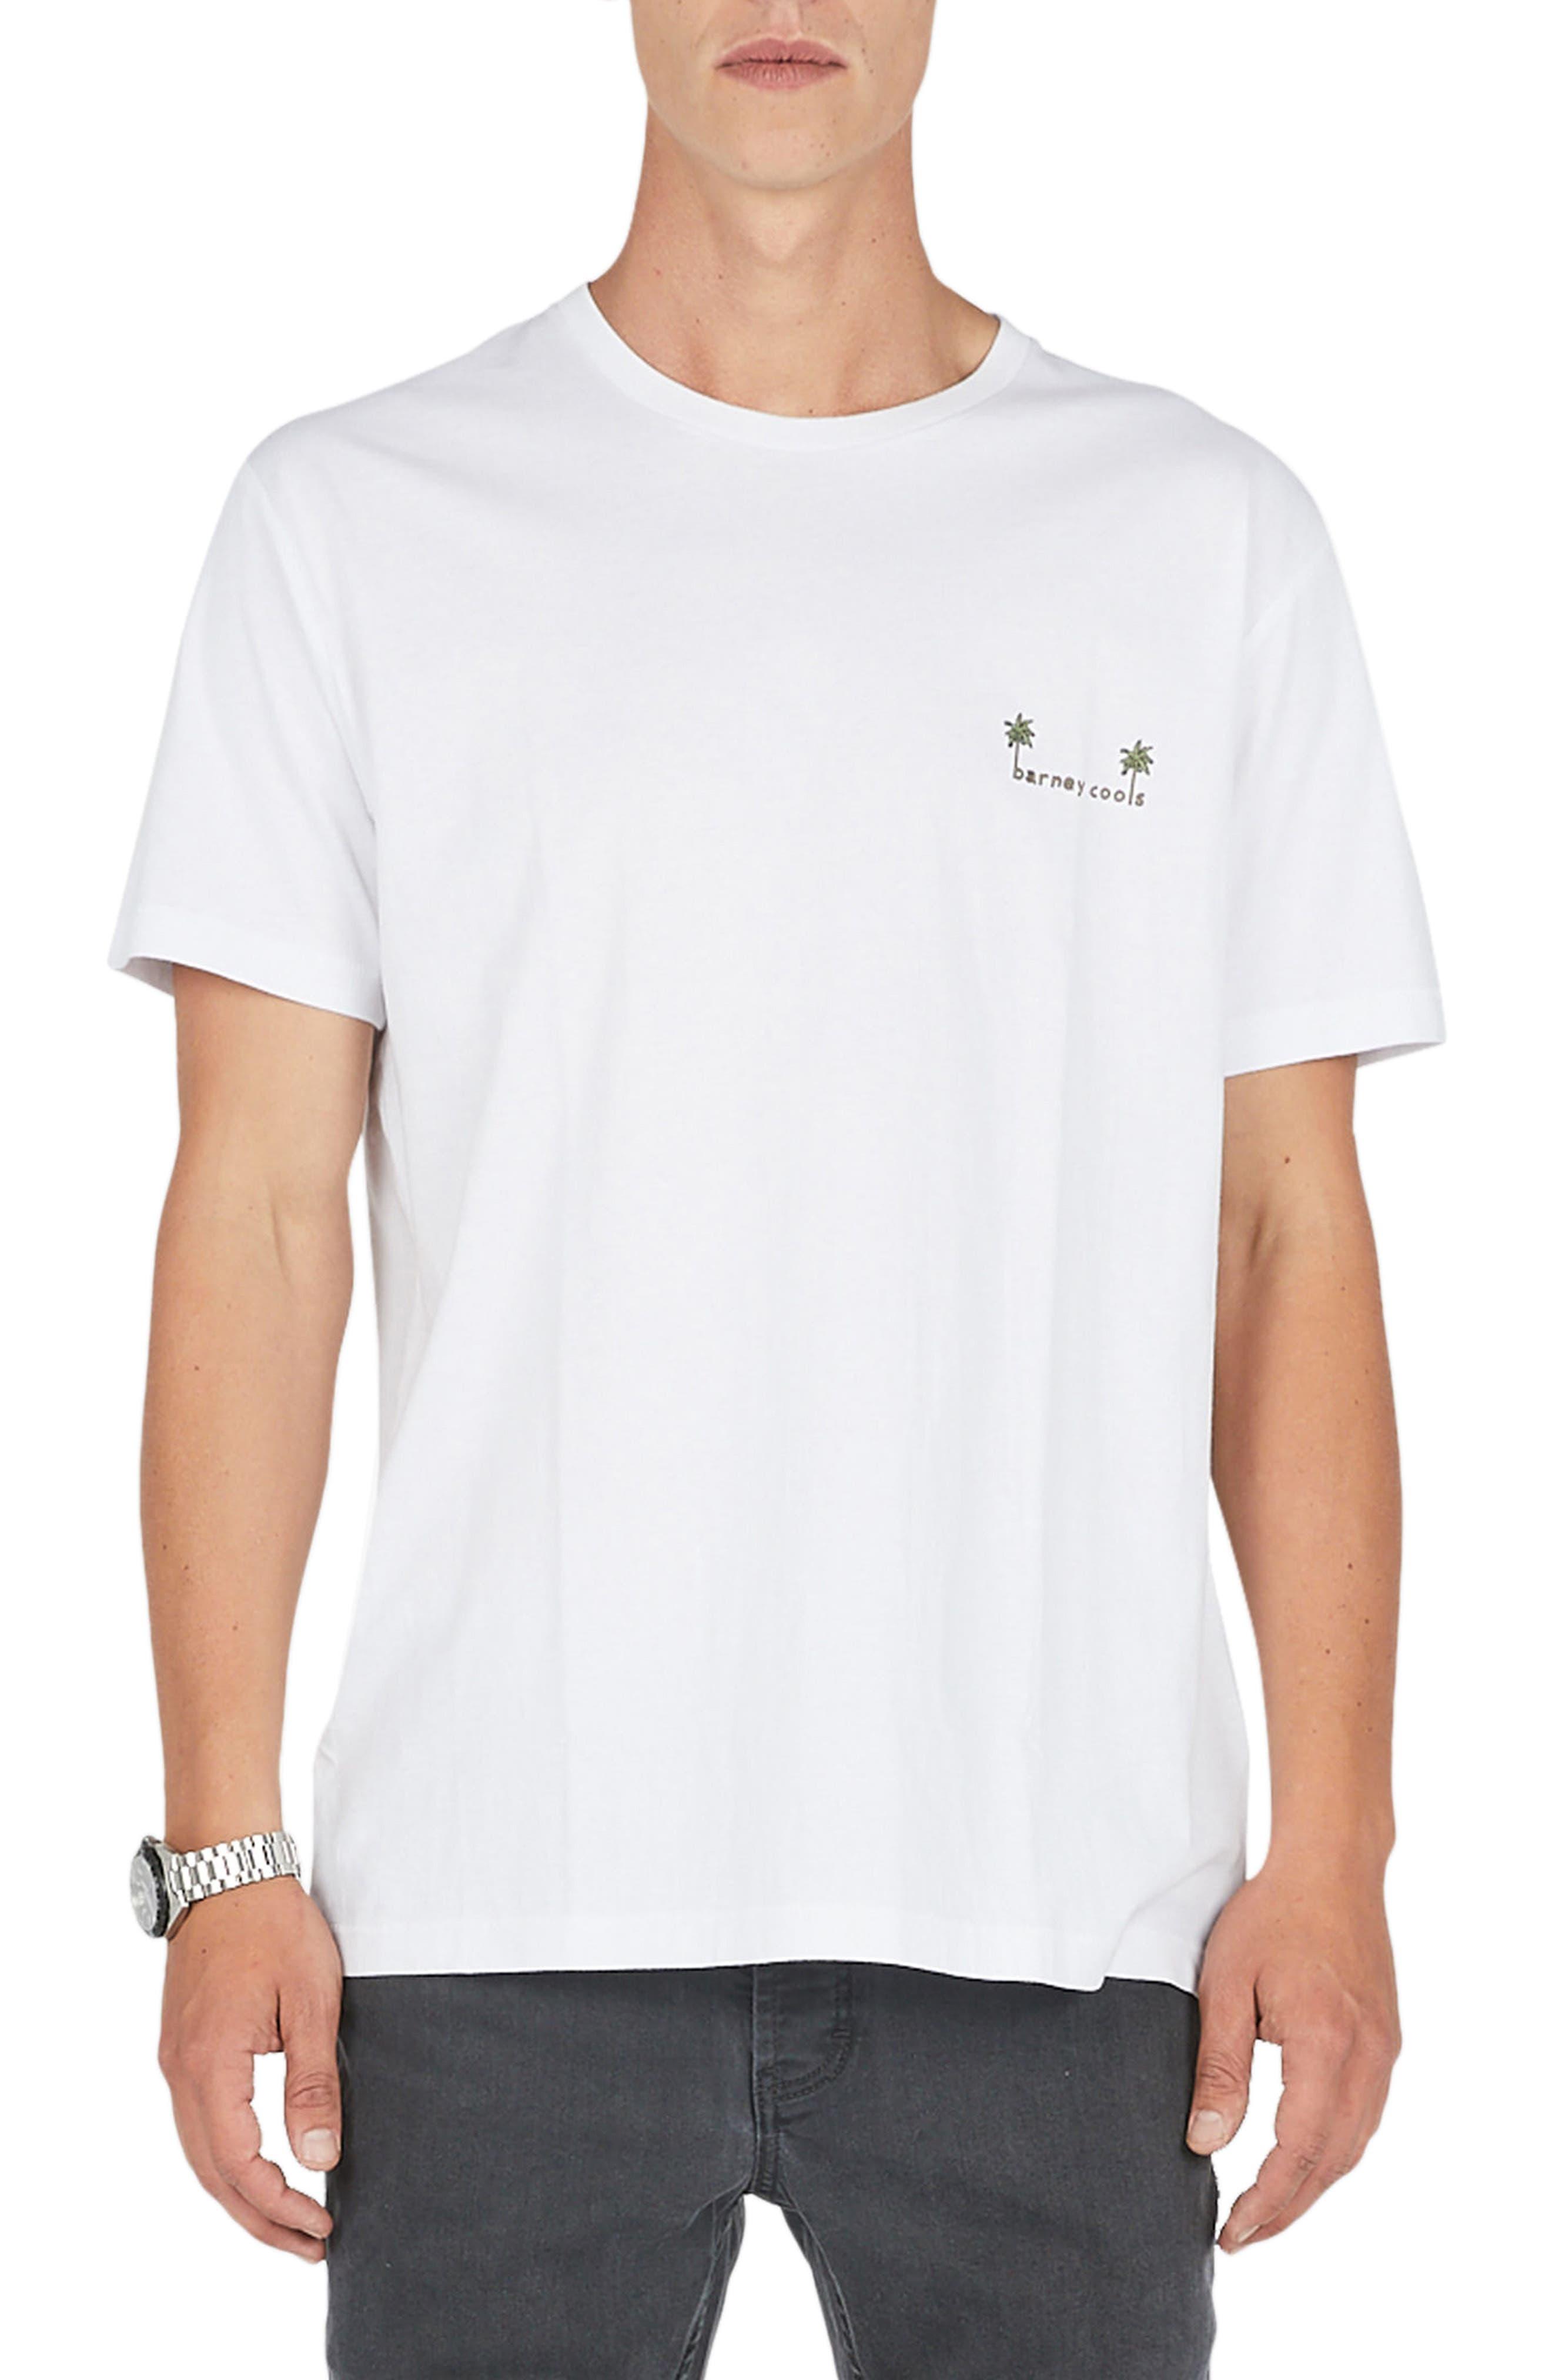 Life's Tough T-Shirt,                         Main,                         color, White